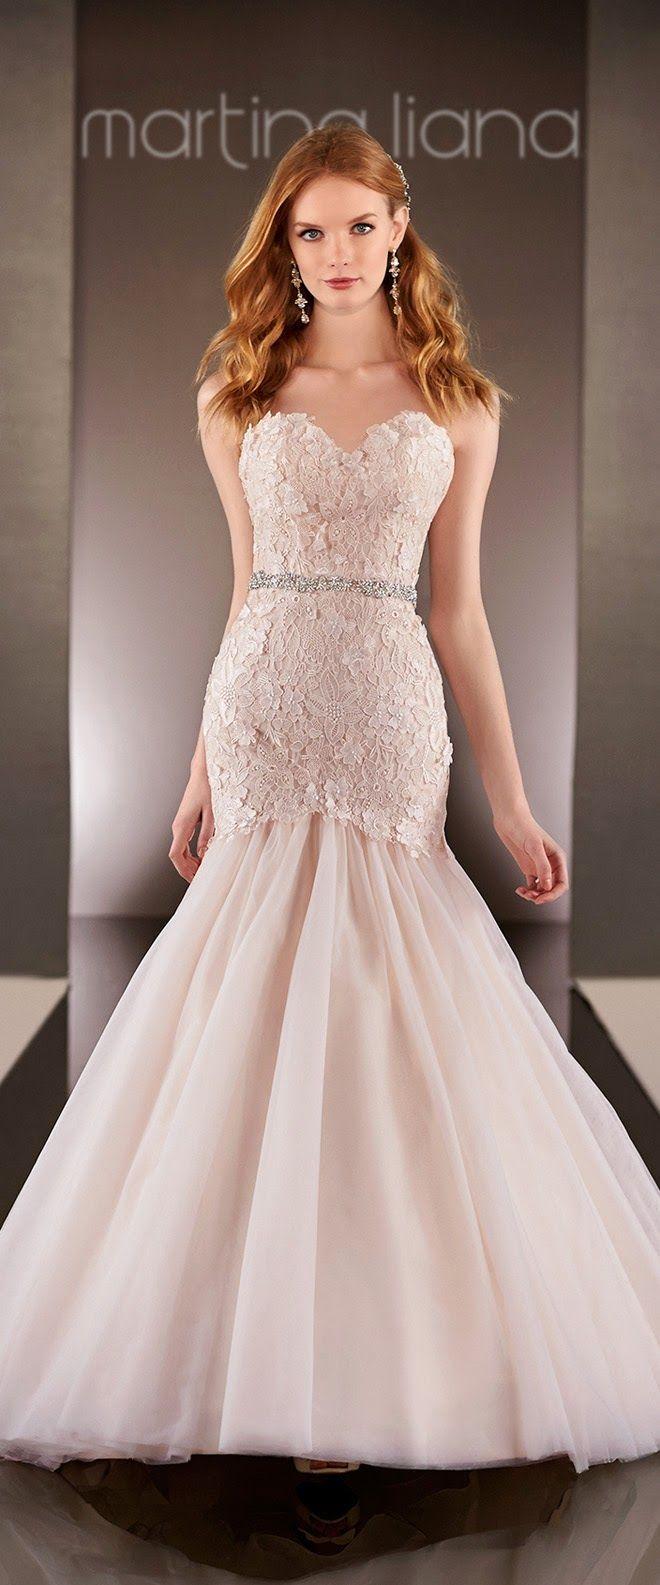 Blush mermaid wedding dress   best Wedding Dresses images on Pinterest  Wedding frocks